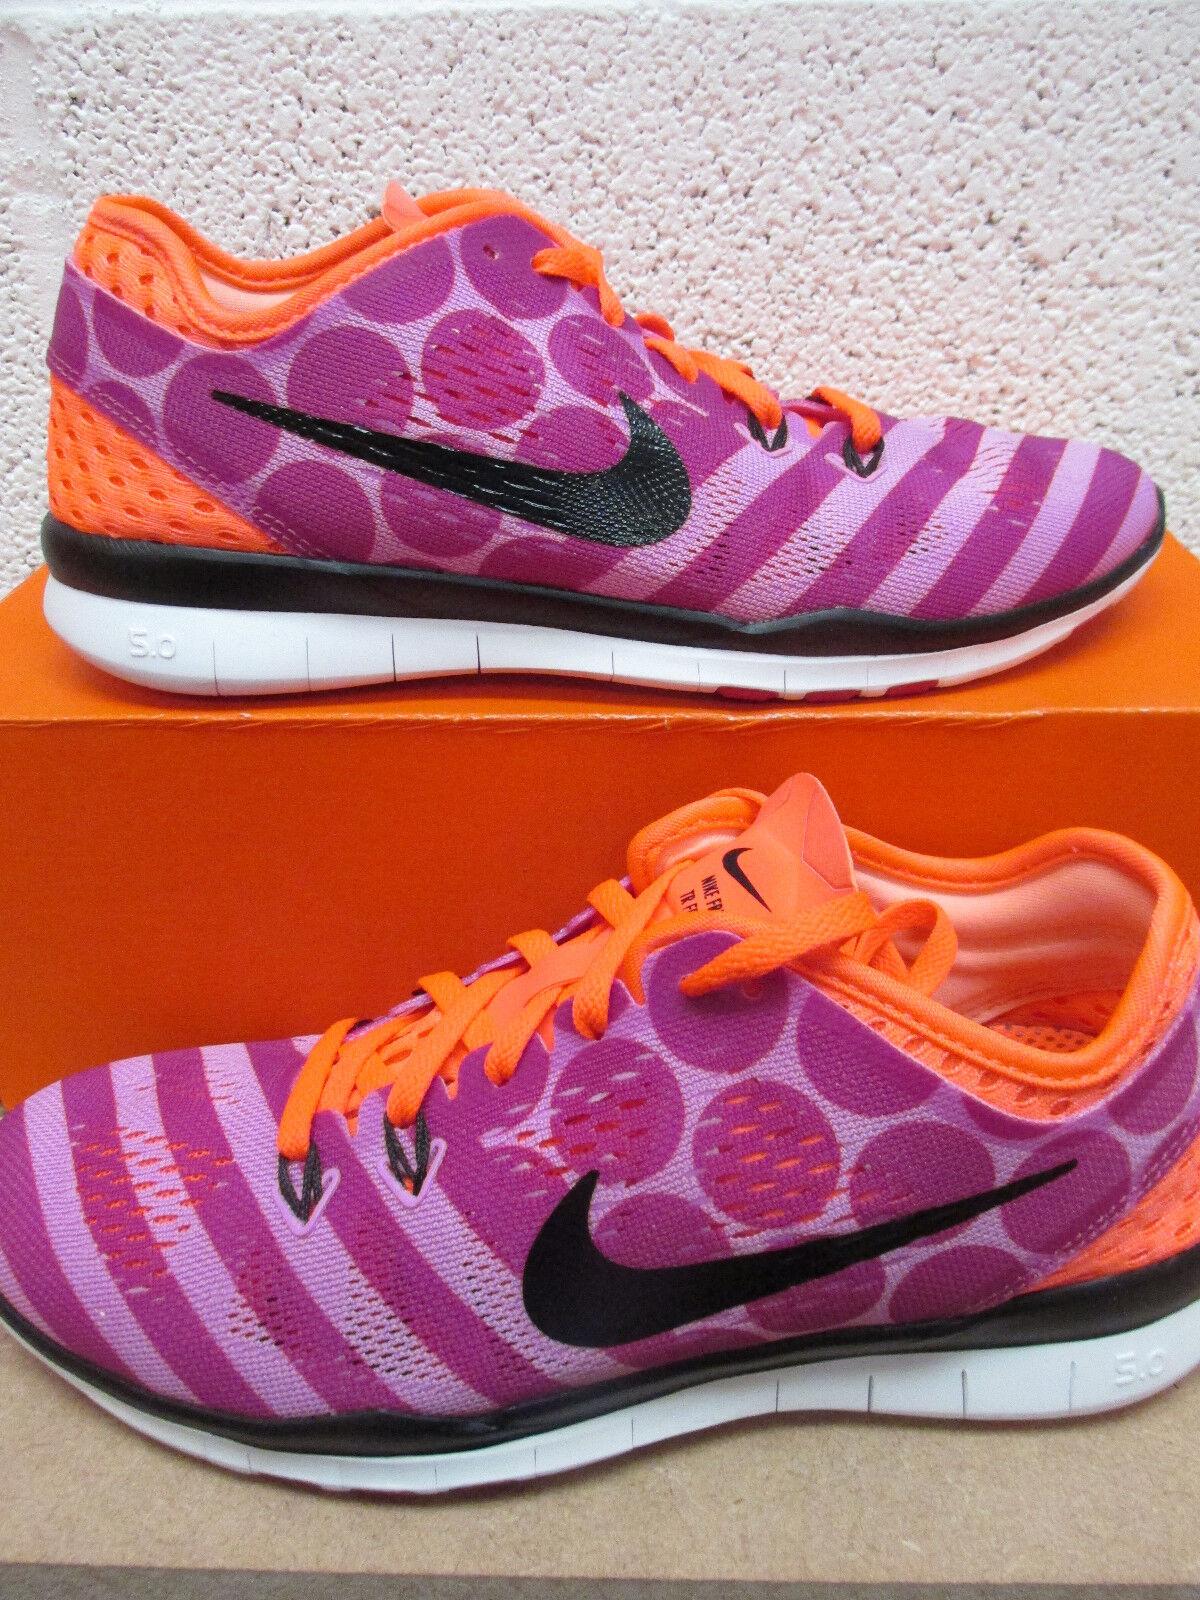 Nike Damen Kostenlose 704695 5.0 Tr Passform 5 Prt Laufschuhe 704695 Kostenlose 500 Turnschuhe 62cf3e